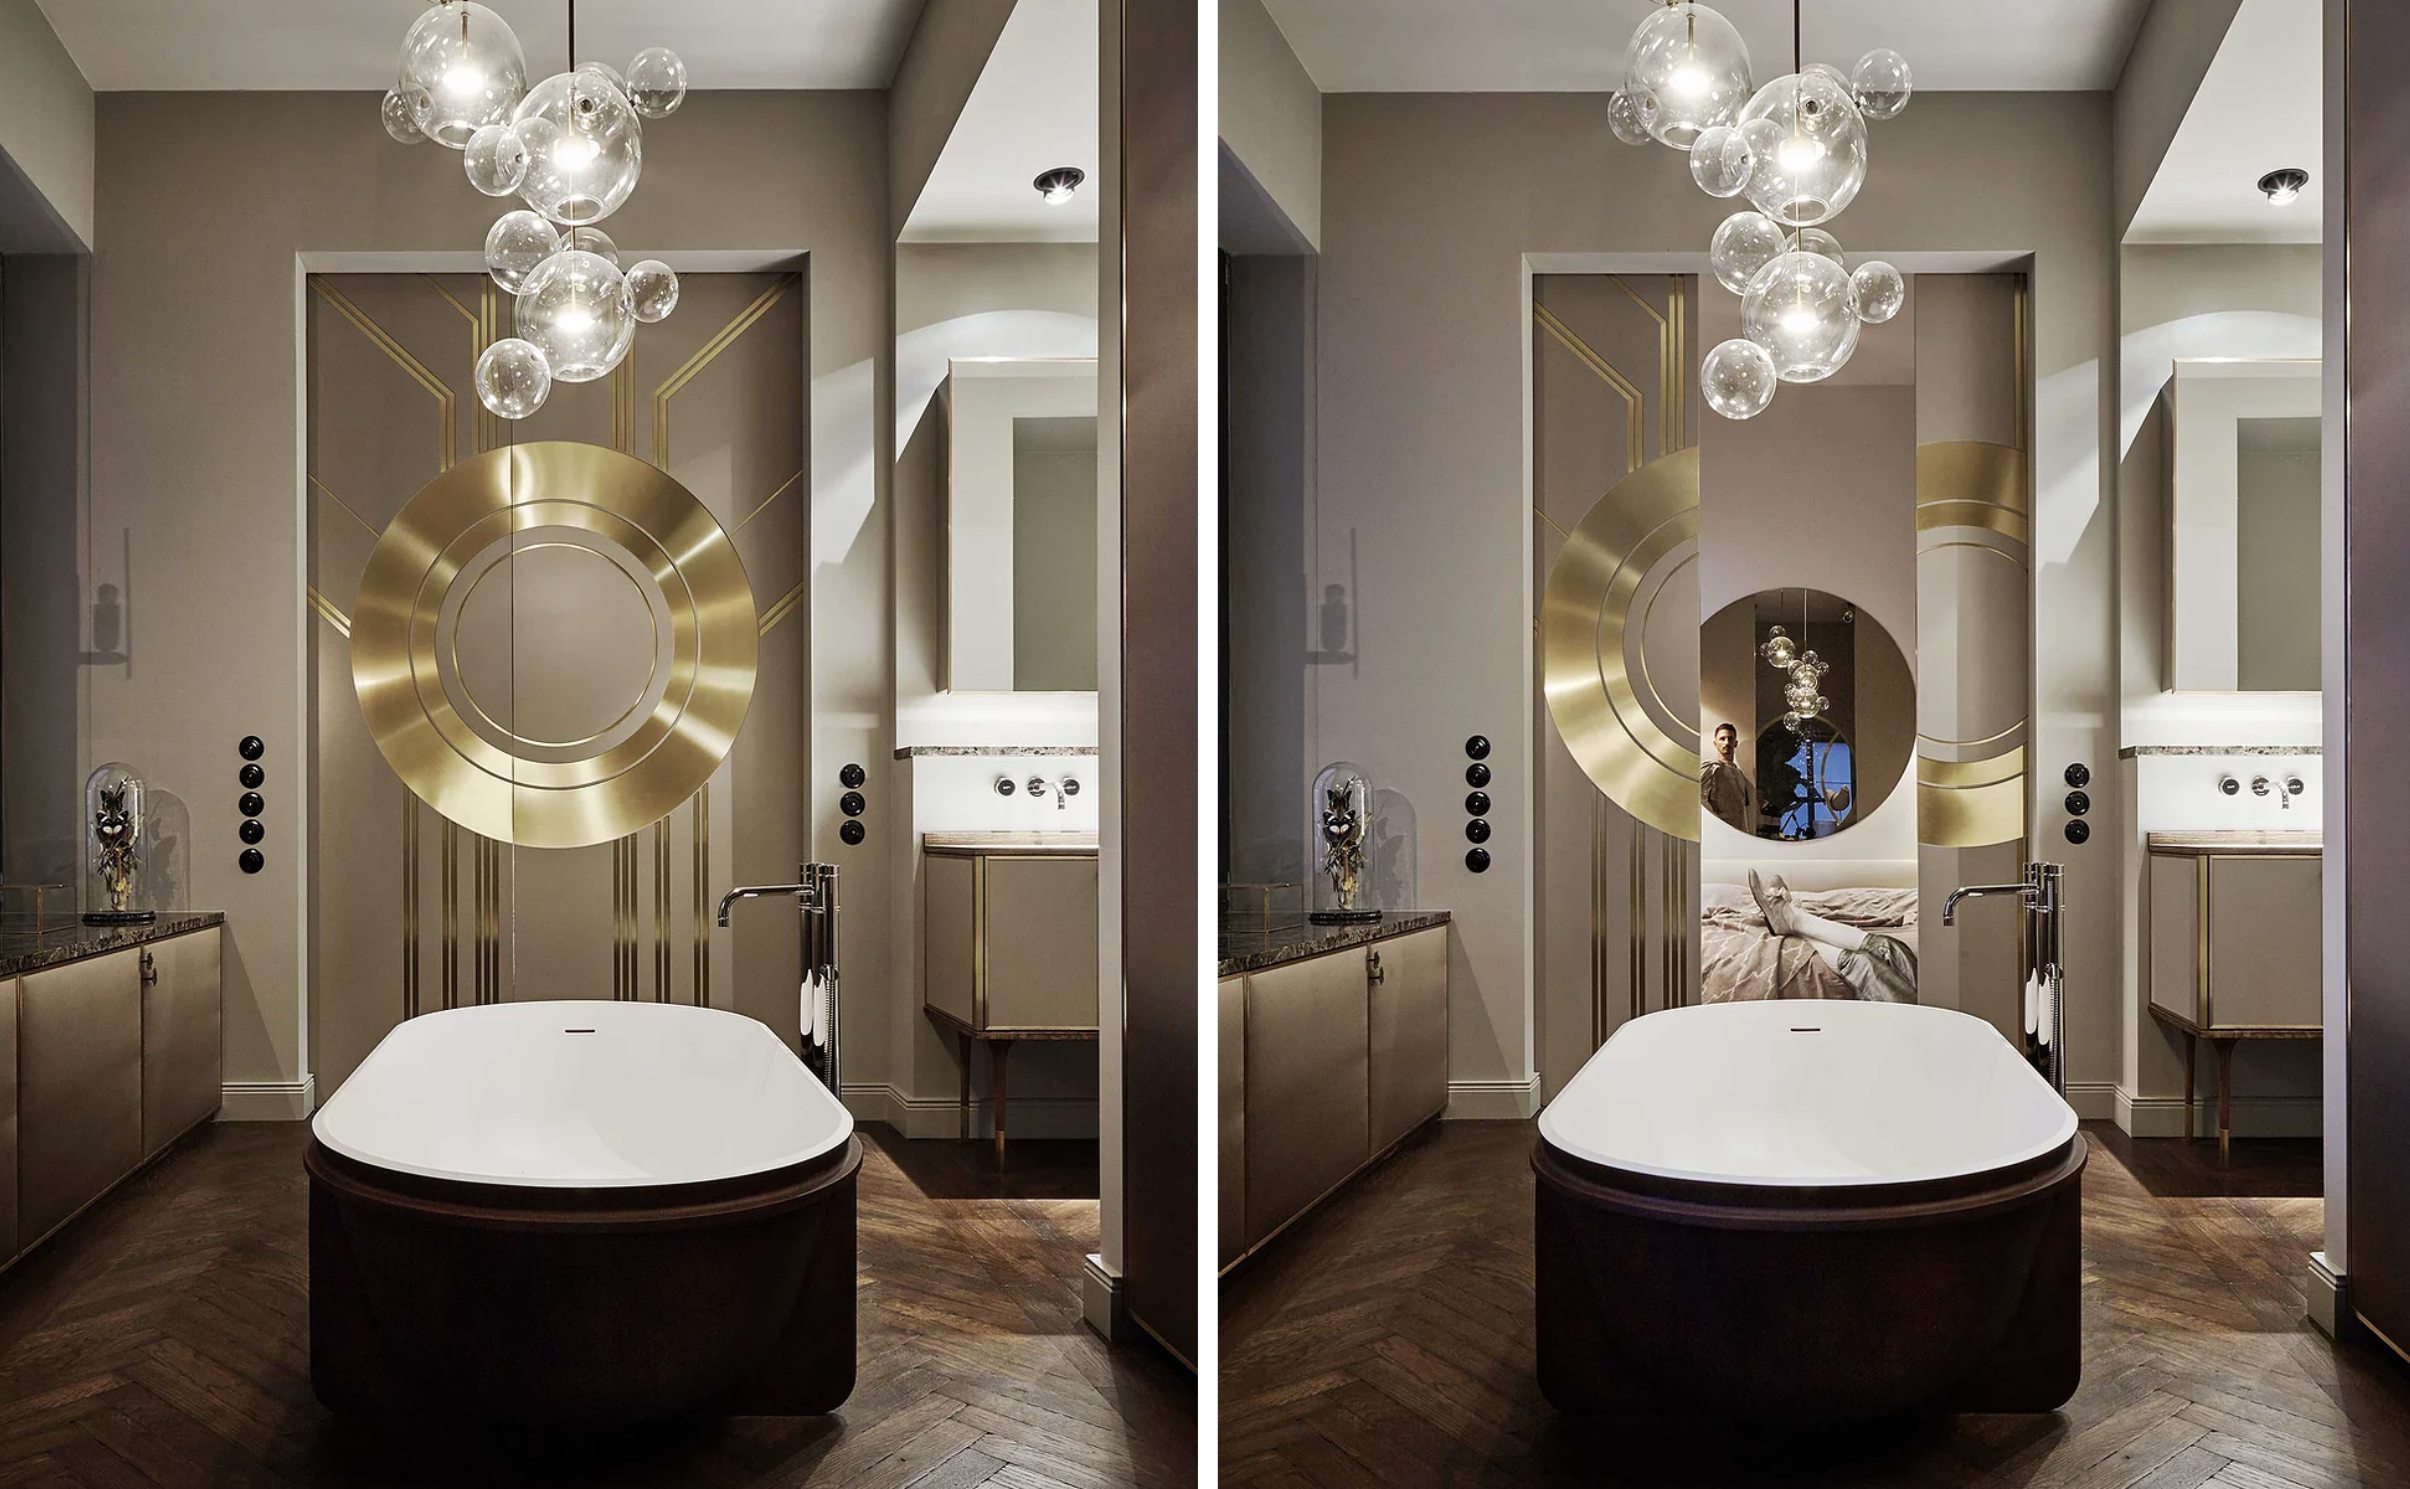 NOVONO, mystic and contemporary bathrooms from Berlin   NOVONO, Mystic And Contemporary Bathrooms From Berlin Captura de ecra   2020 11 18 a  s 16